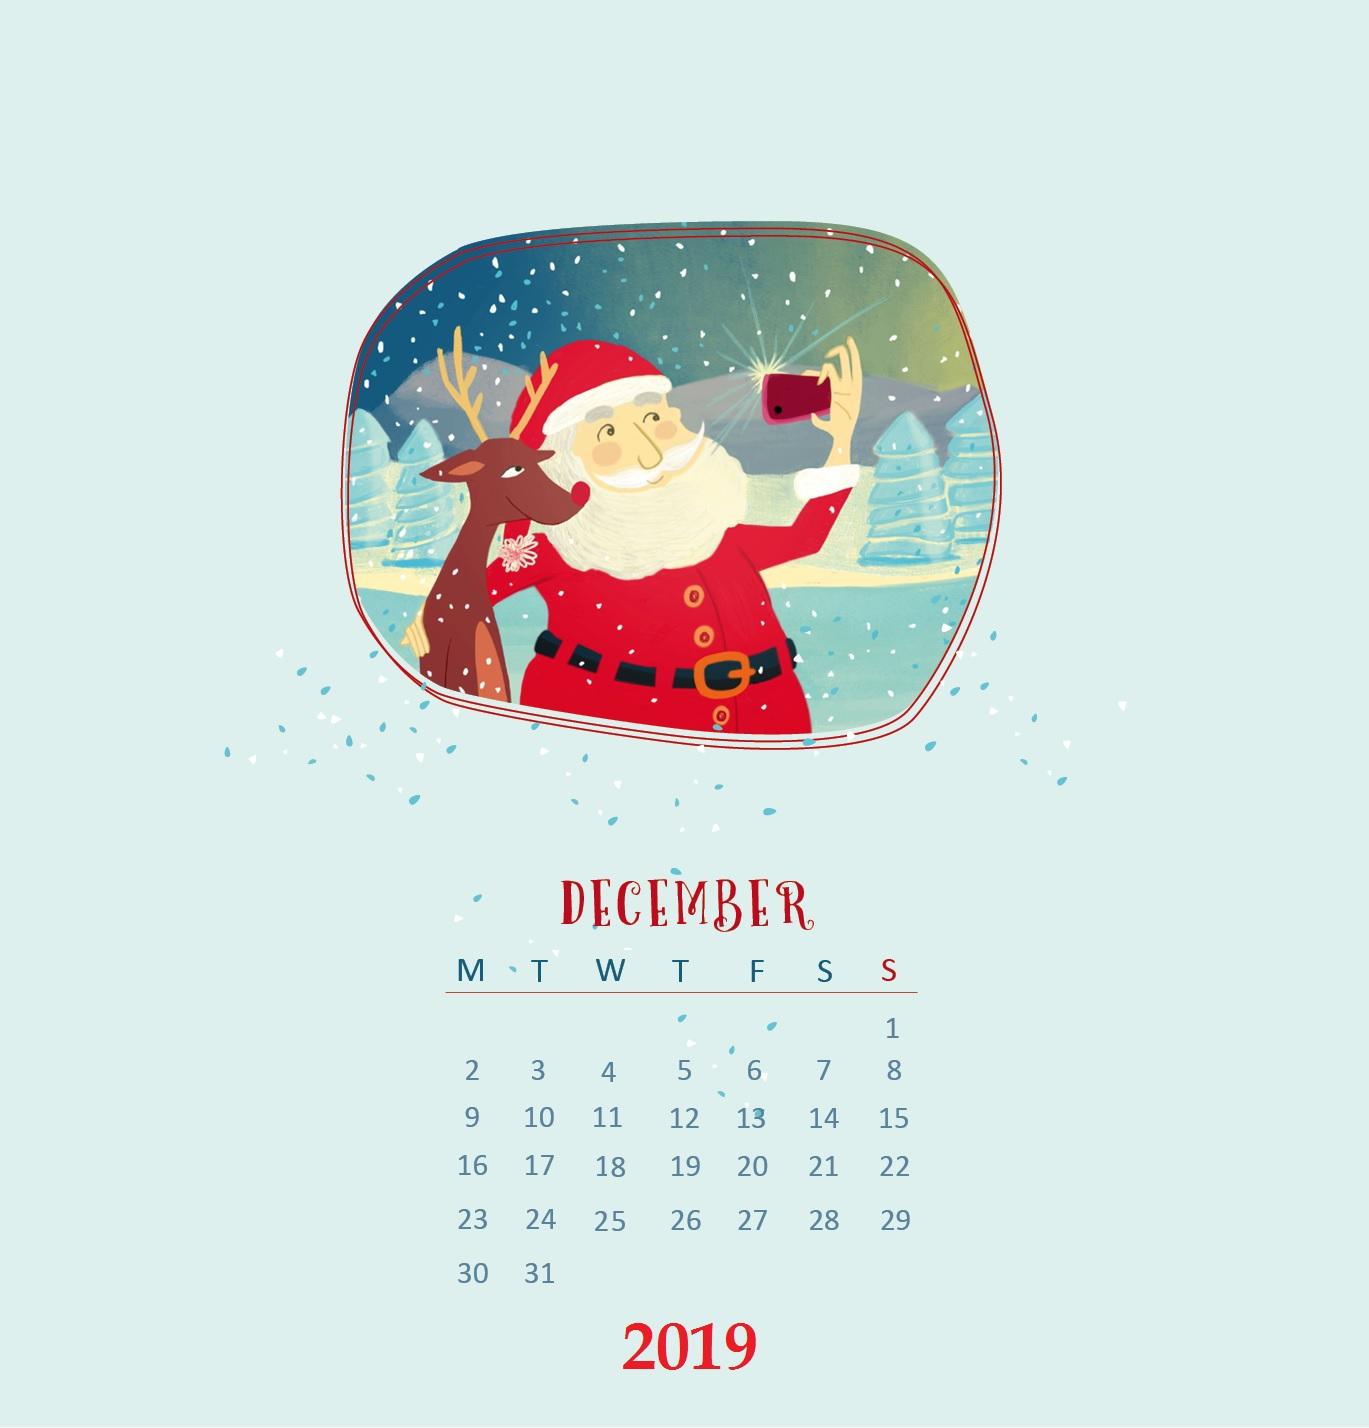 Cute December 2019 iPhone Wallpaper